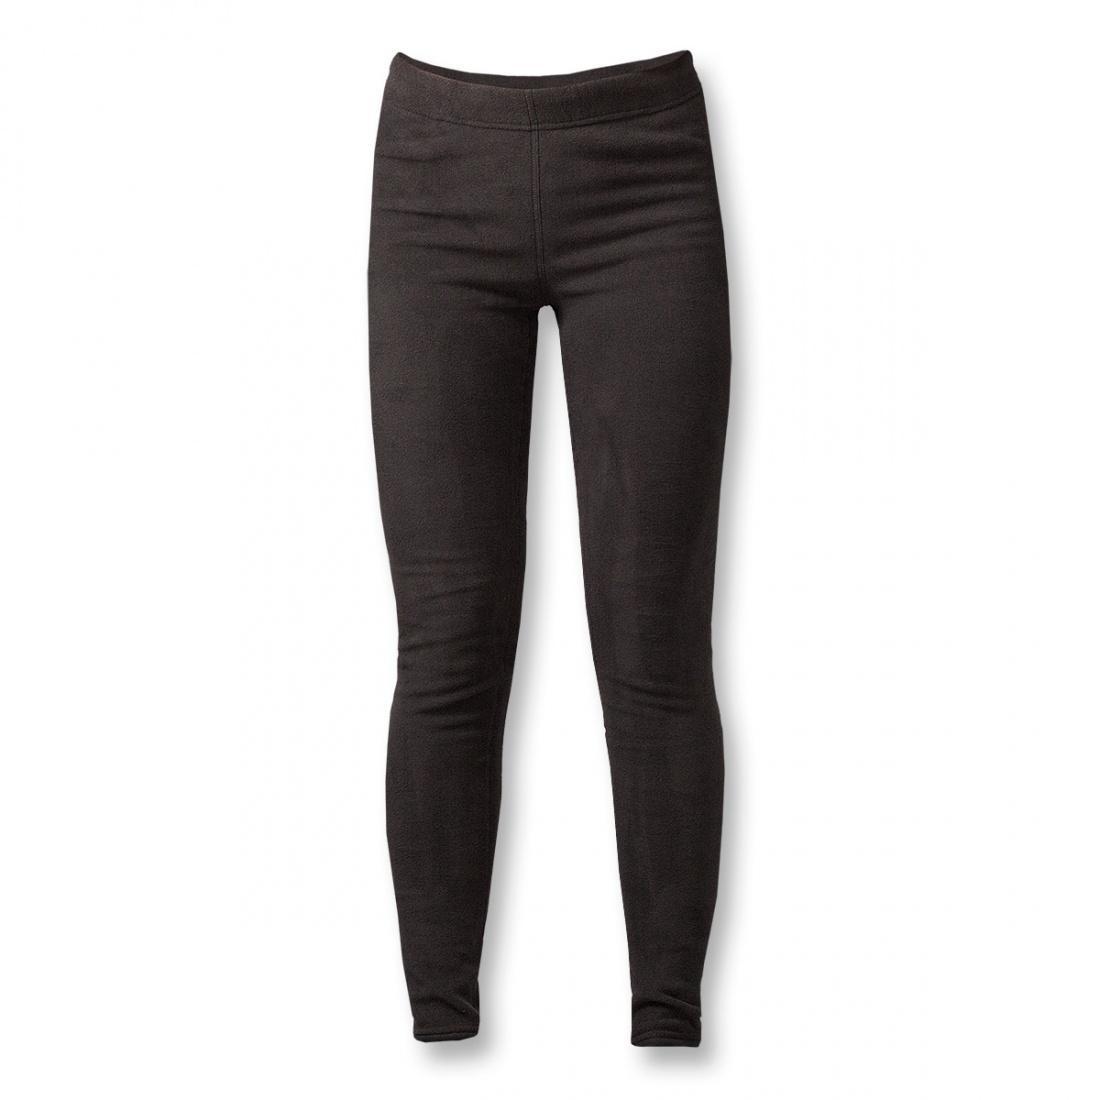 Термобелье брюки Penguin 100 Micro Женские от Планета Спорт